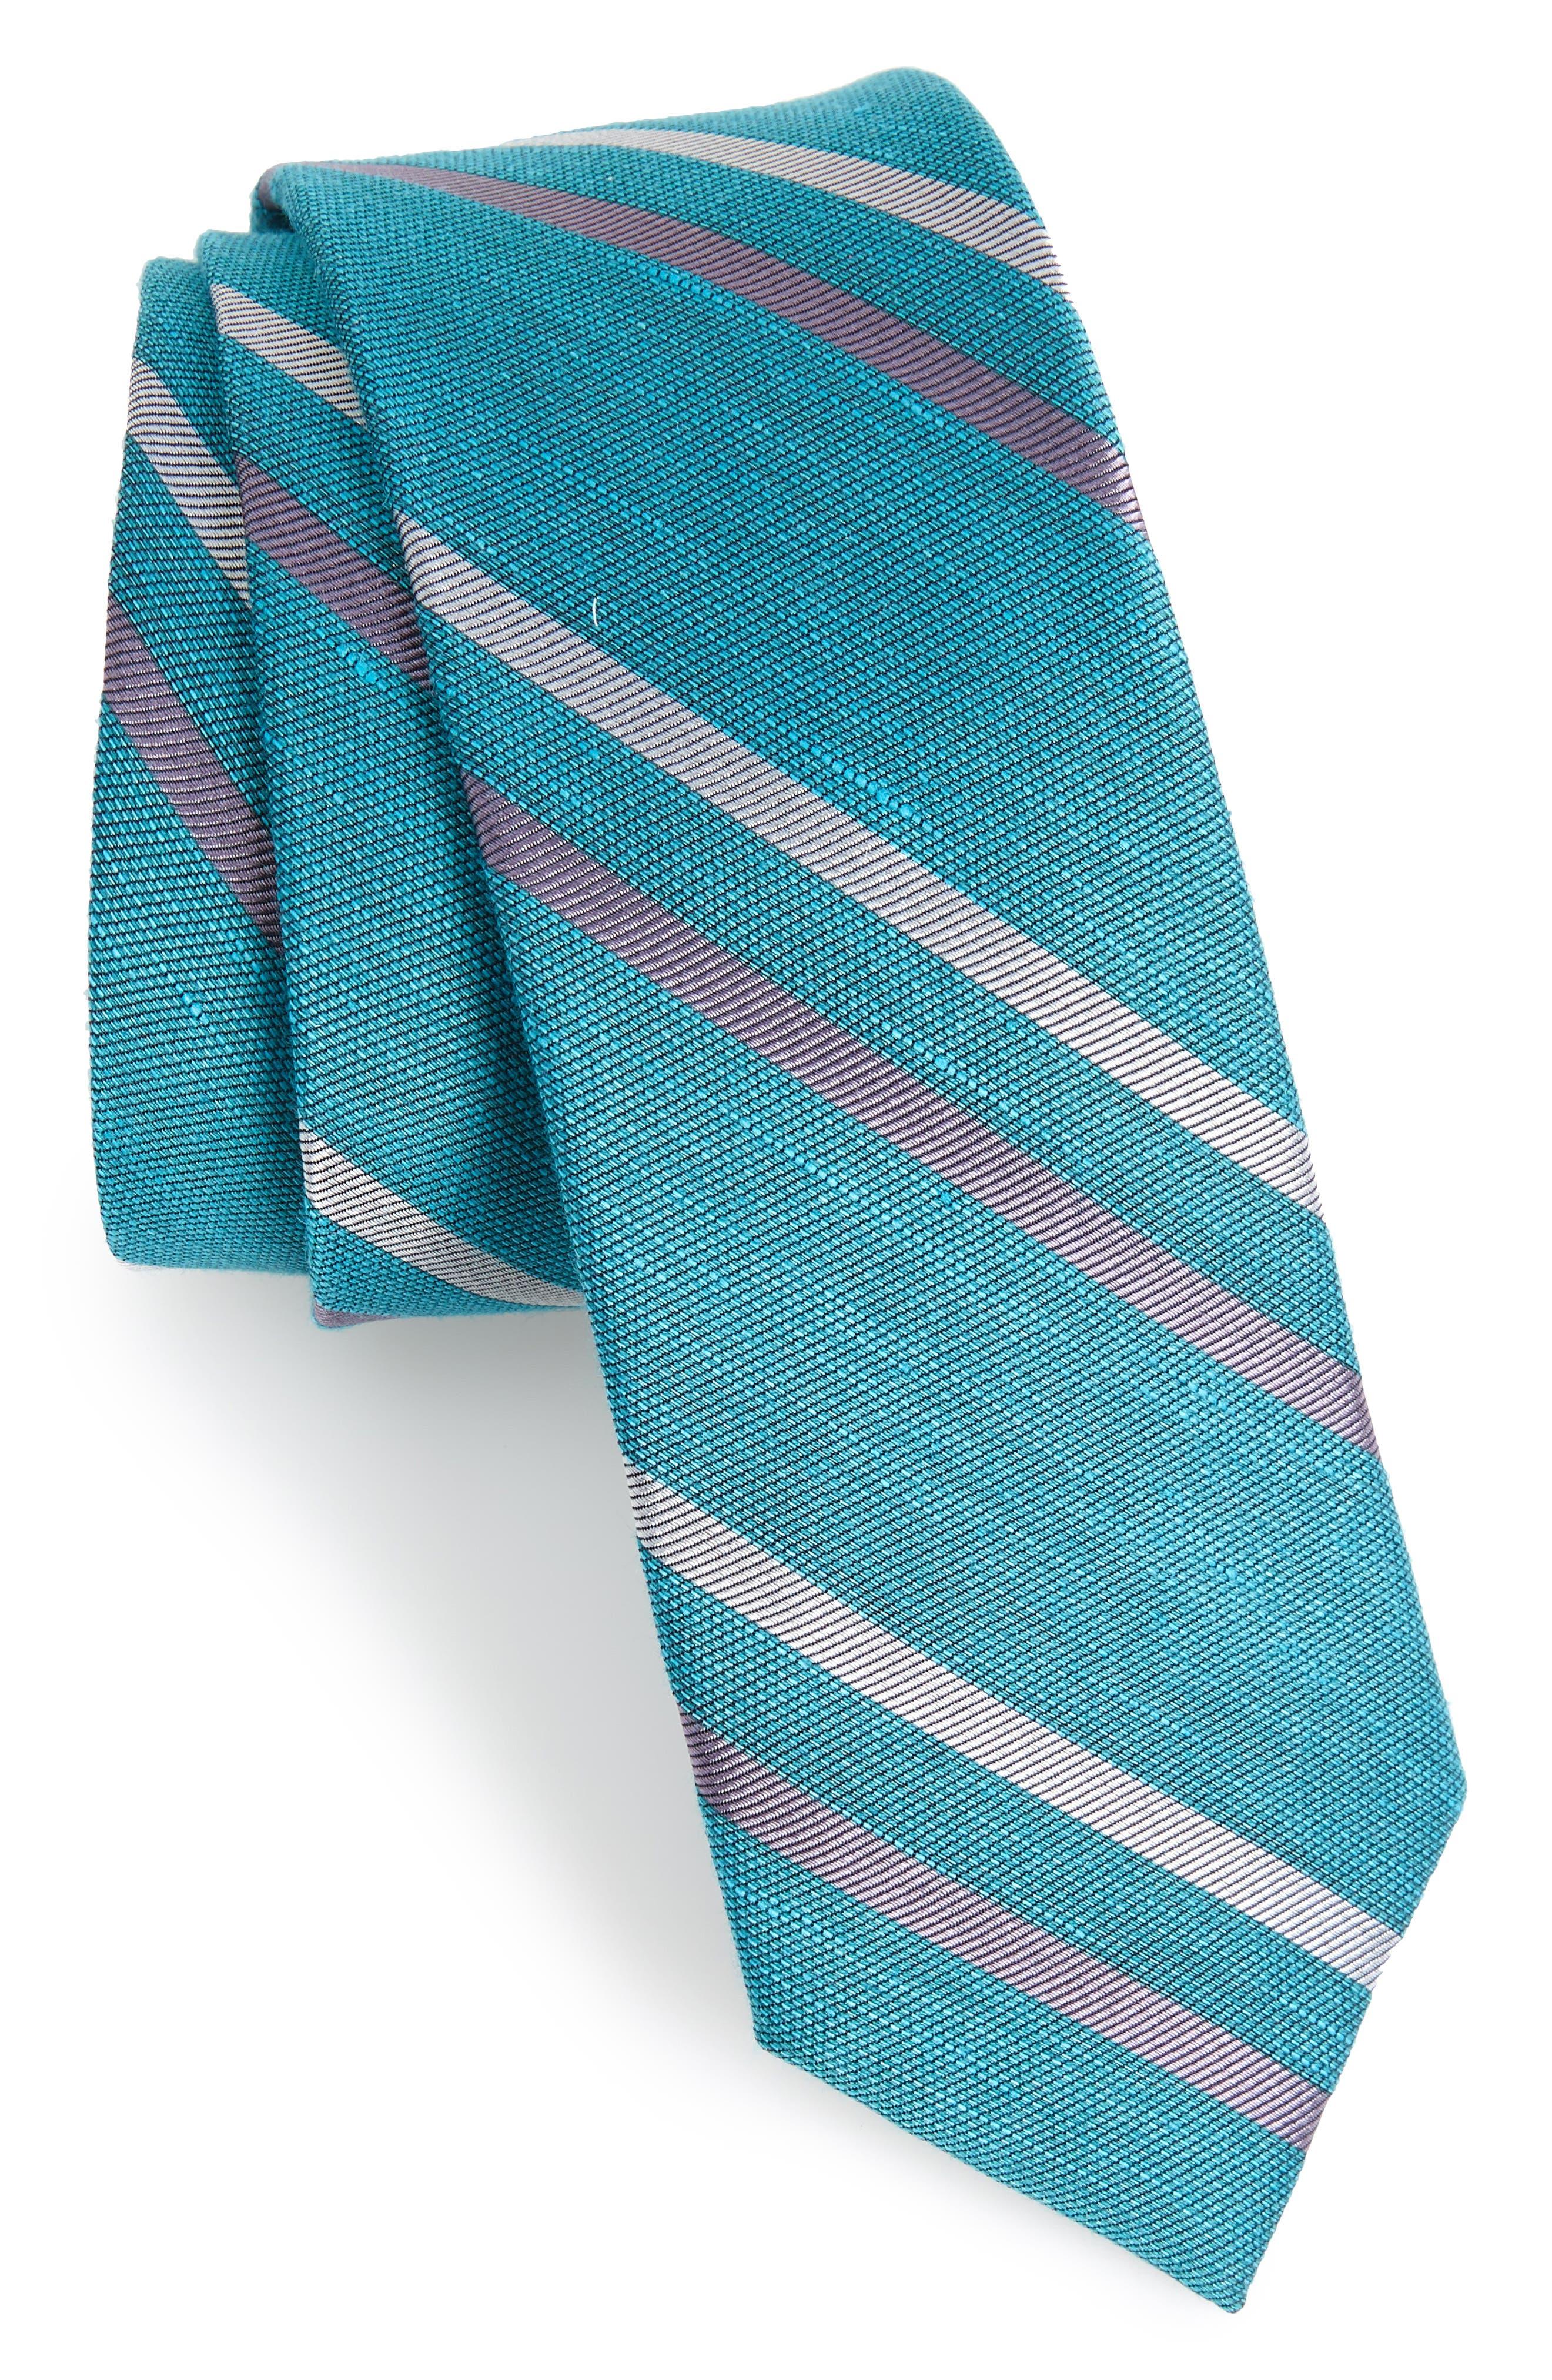 Pep Stripe Tie,                             Main thumbnail 1, color,                             AQUA